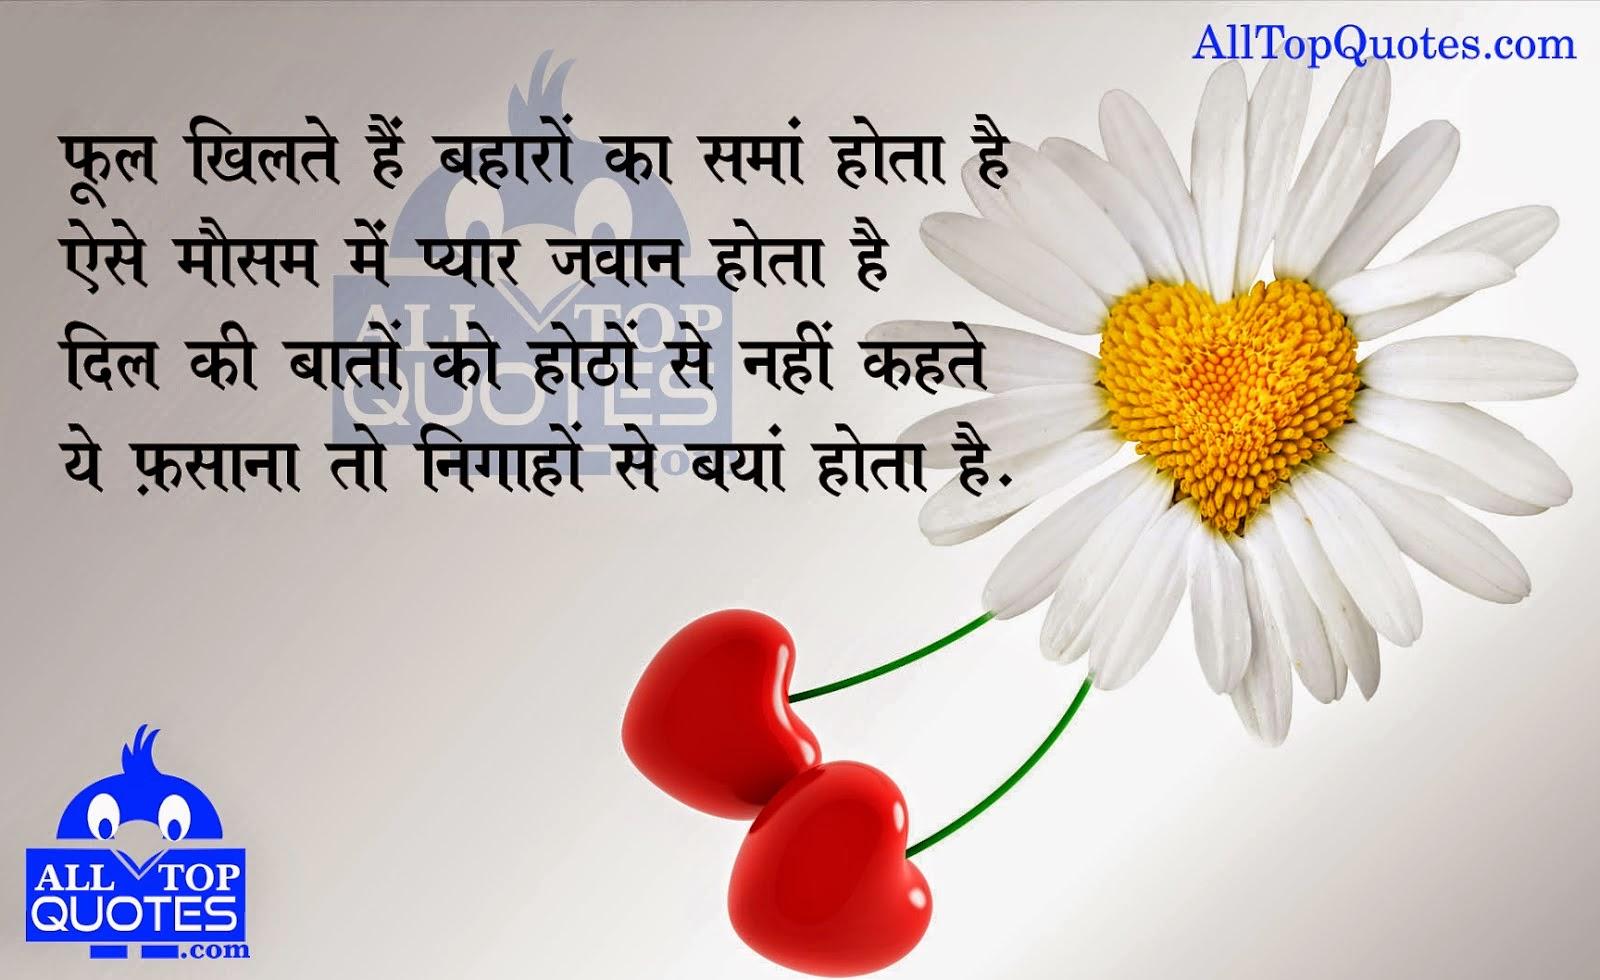 Hindi Romantic Love Quotation Www 4uquotes Com